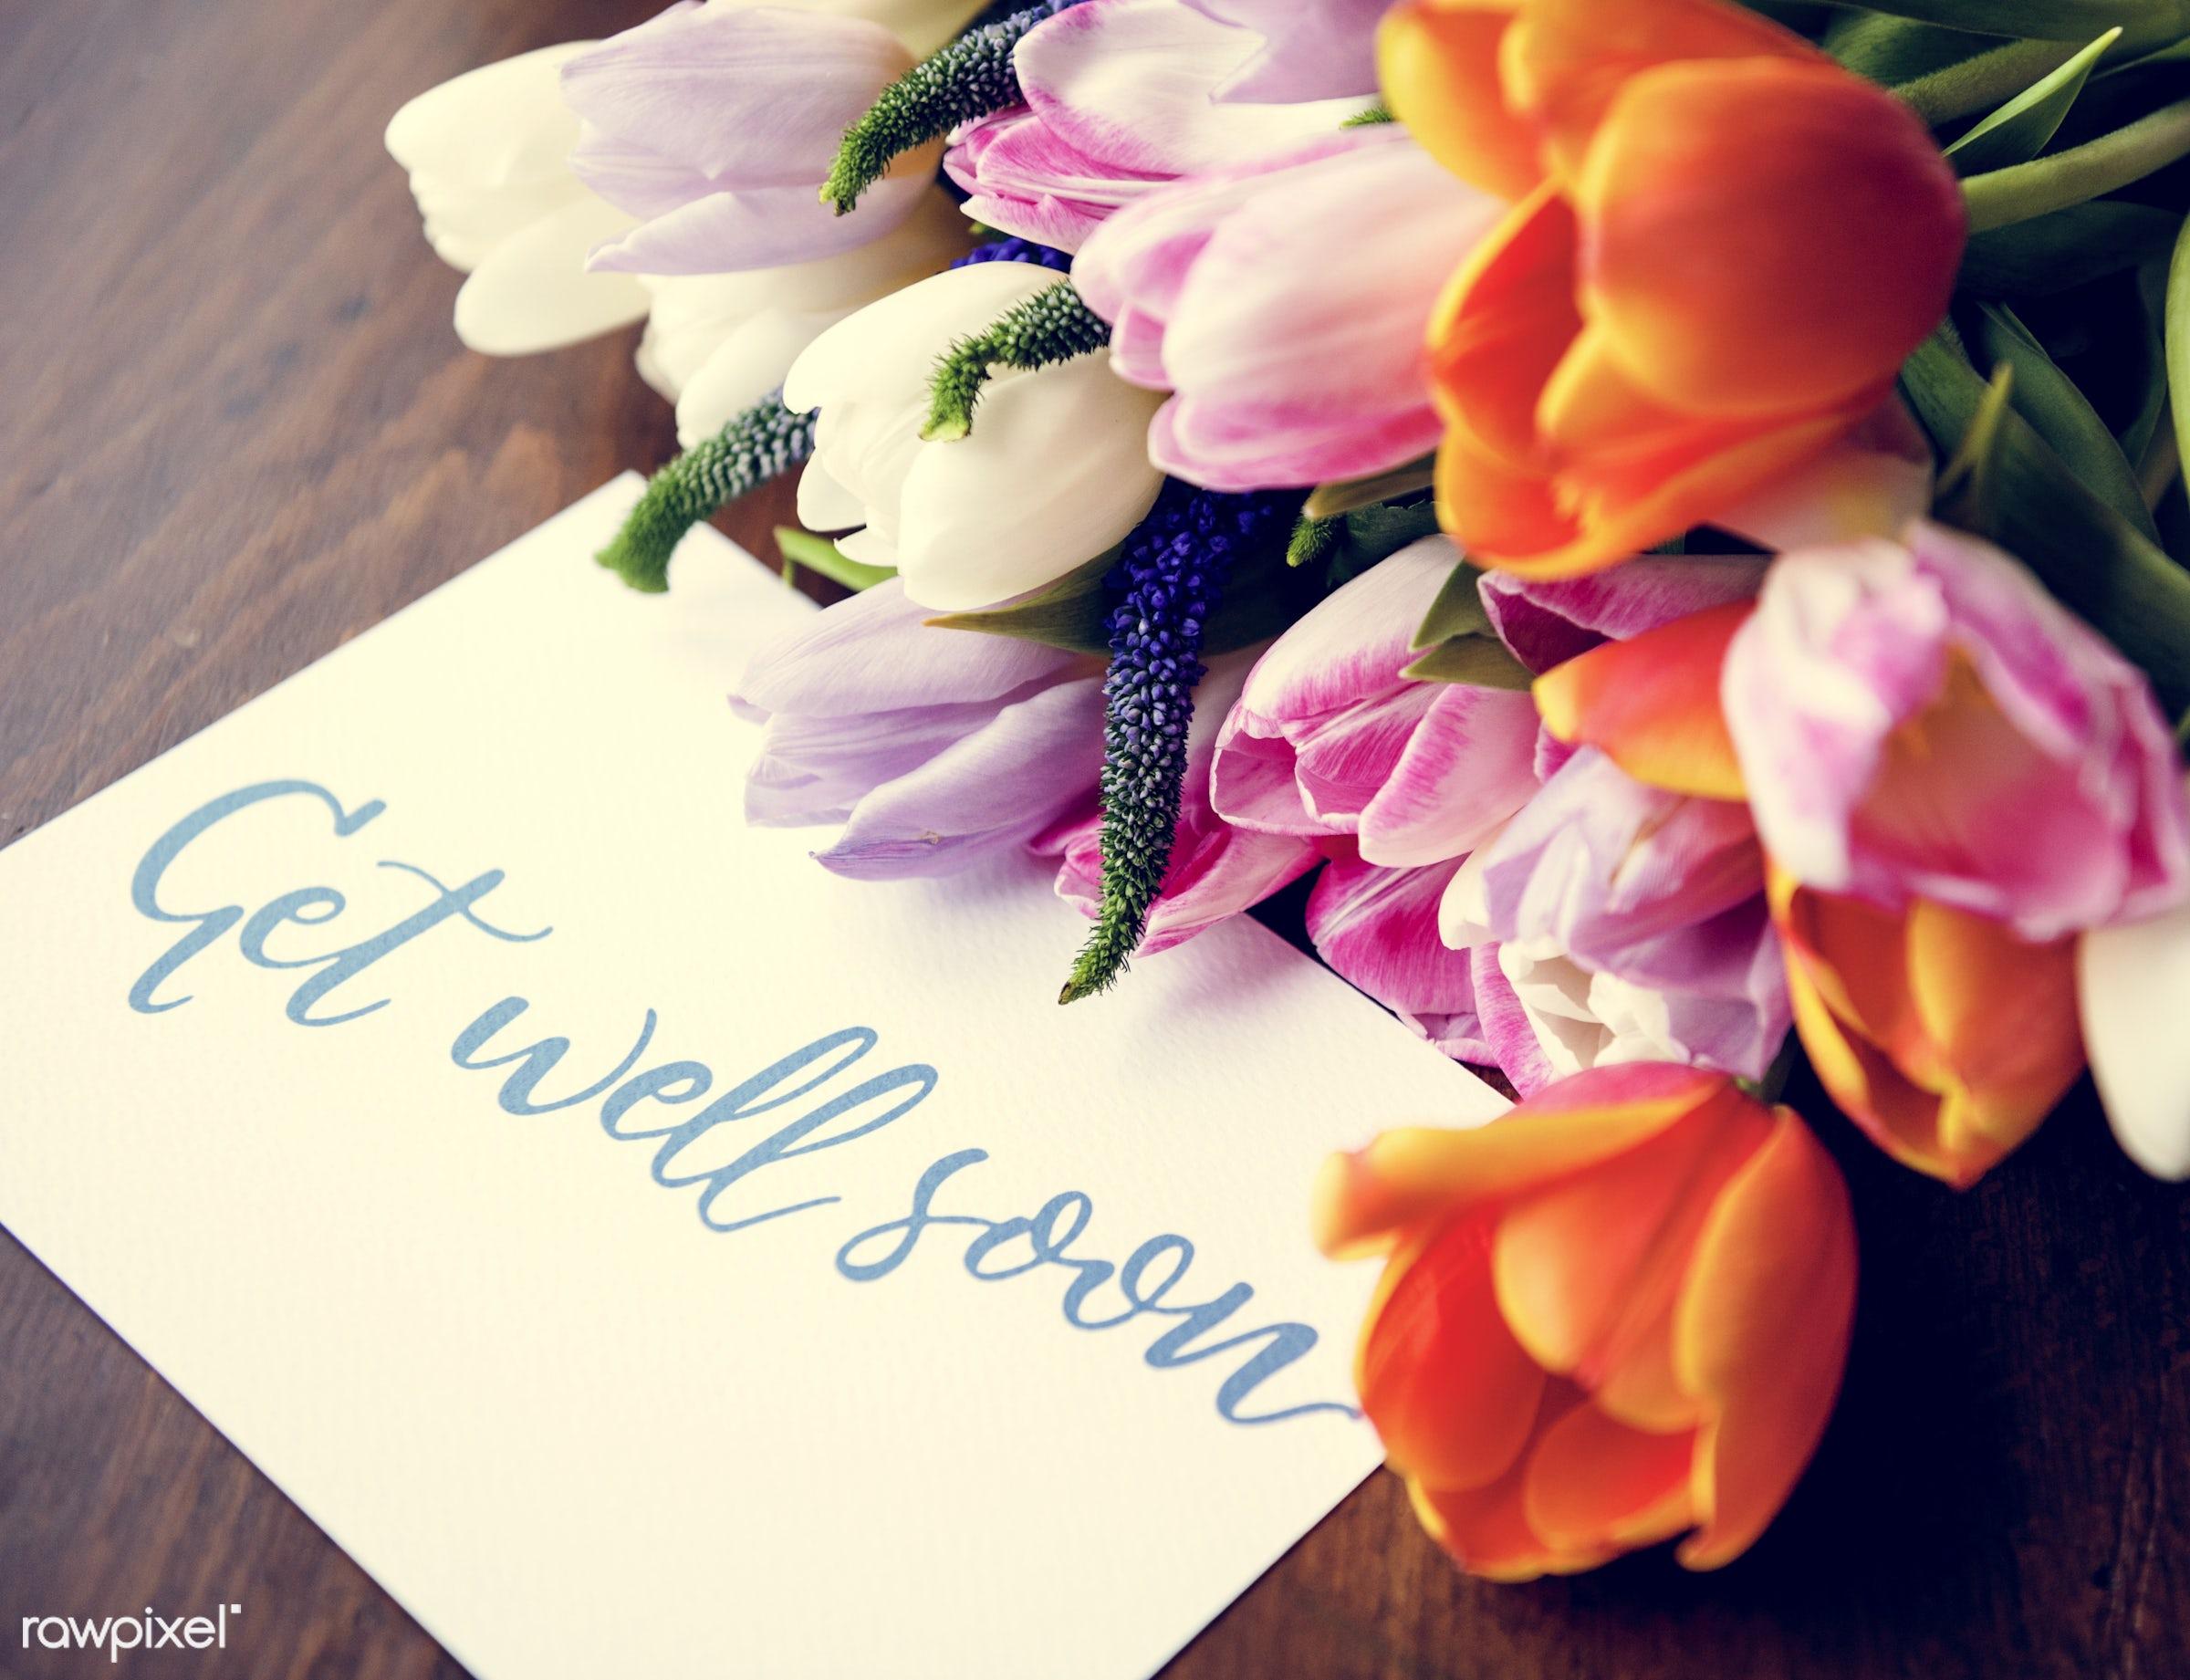 nobody, detail, wish, show, decor, love, nature, care, card, flowers, get, refreshment, florist, present, arrangement, tulip...